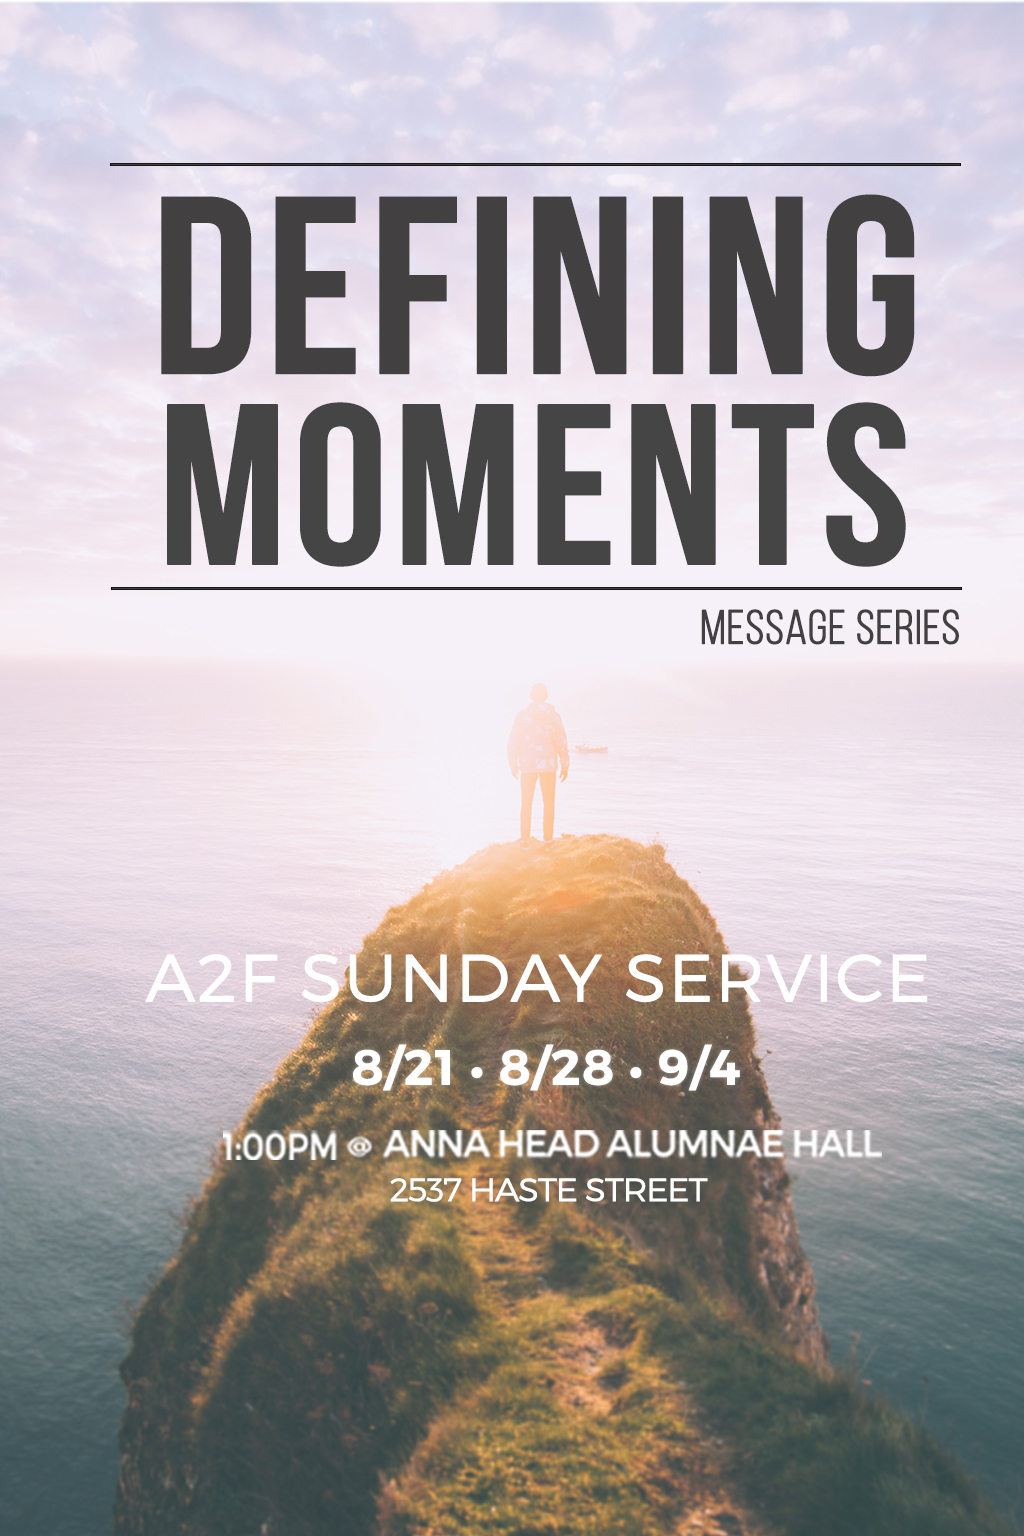 acts2fellowship-christian-fellowship-college-berkeley-sunday-service